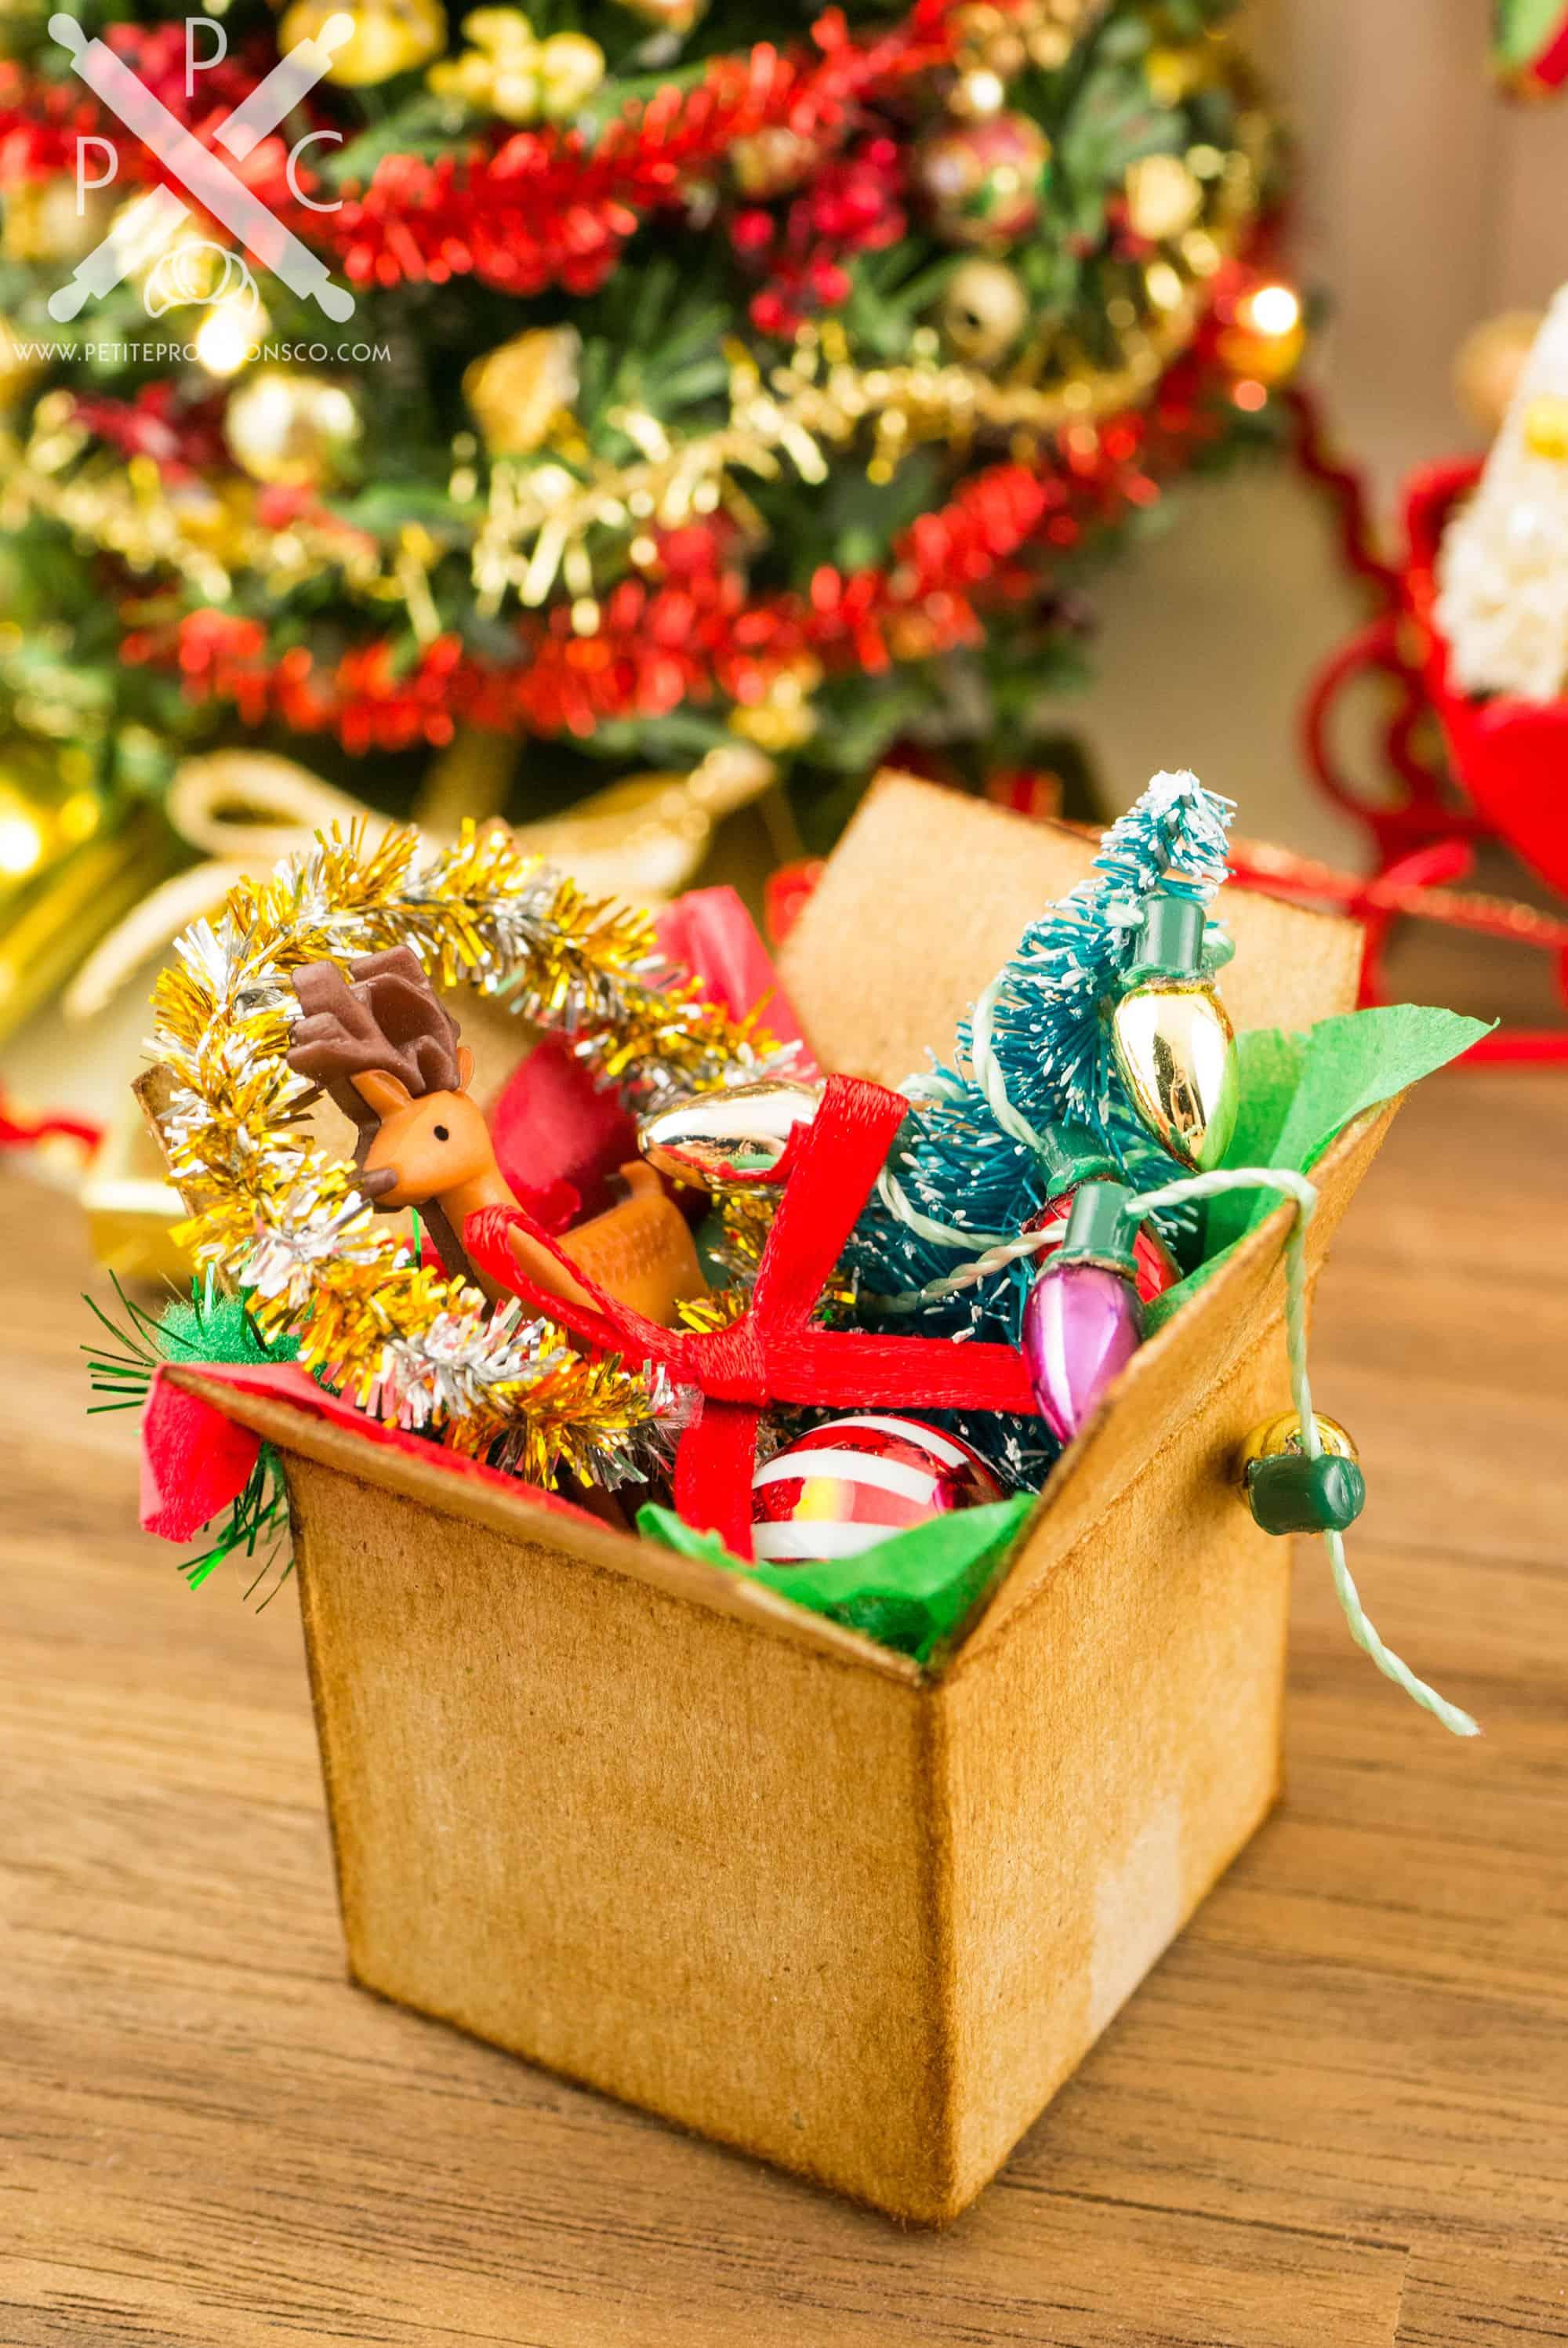 Christmas Dollhouse Decorations.Christmas Decorations In Cardboard Box